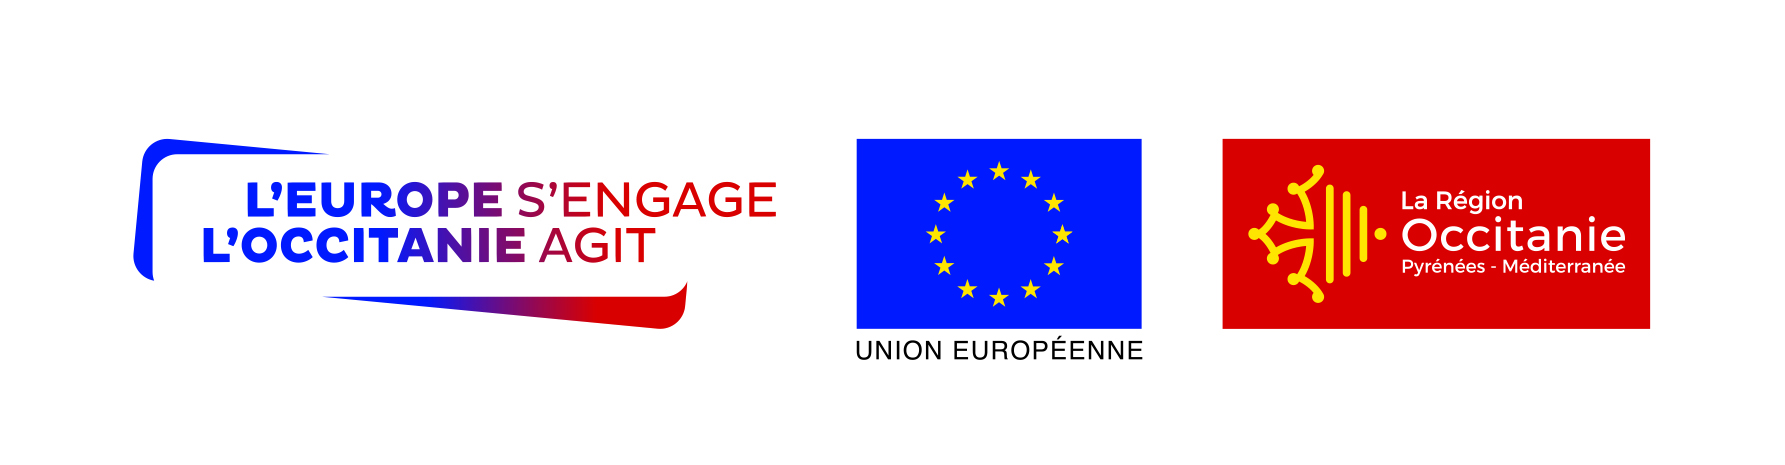 Union Européenne et Region Occitanie